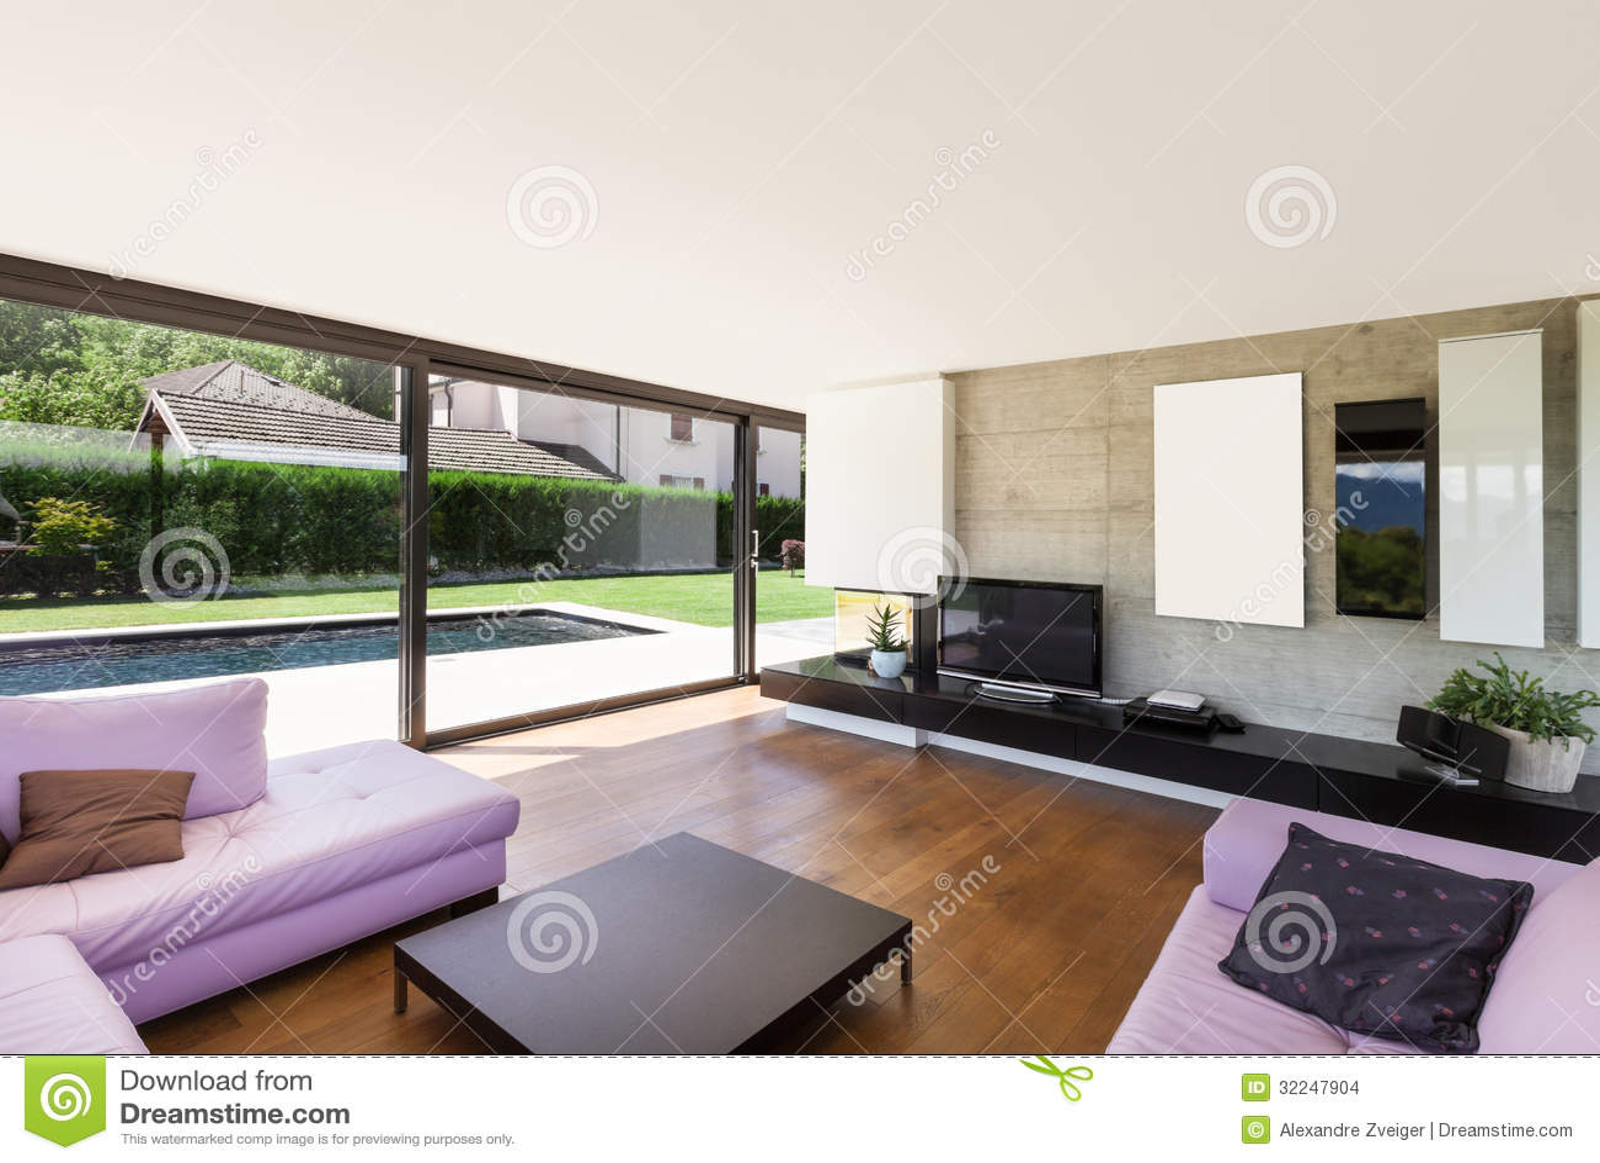 Casa de campo moderna interior sala de visitas imagens - Casas modernas interior ...